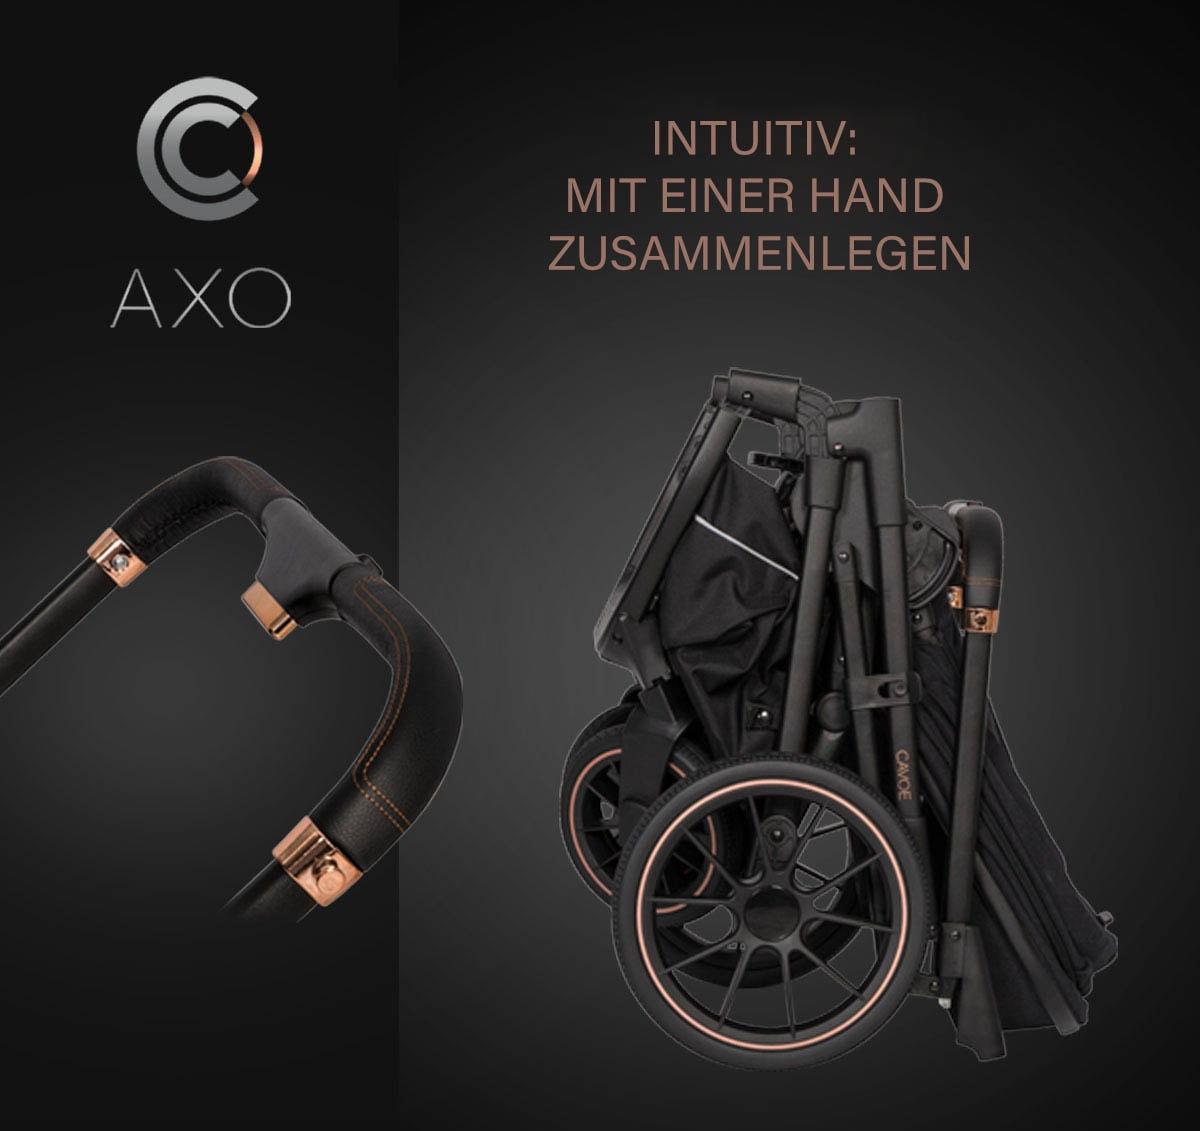 Cavoe AXO Kinderwagen Gestell